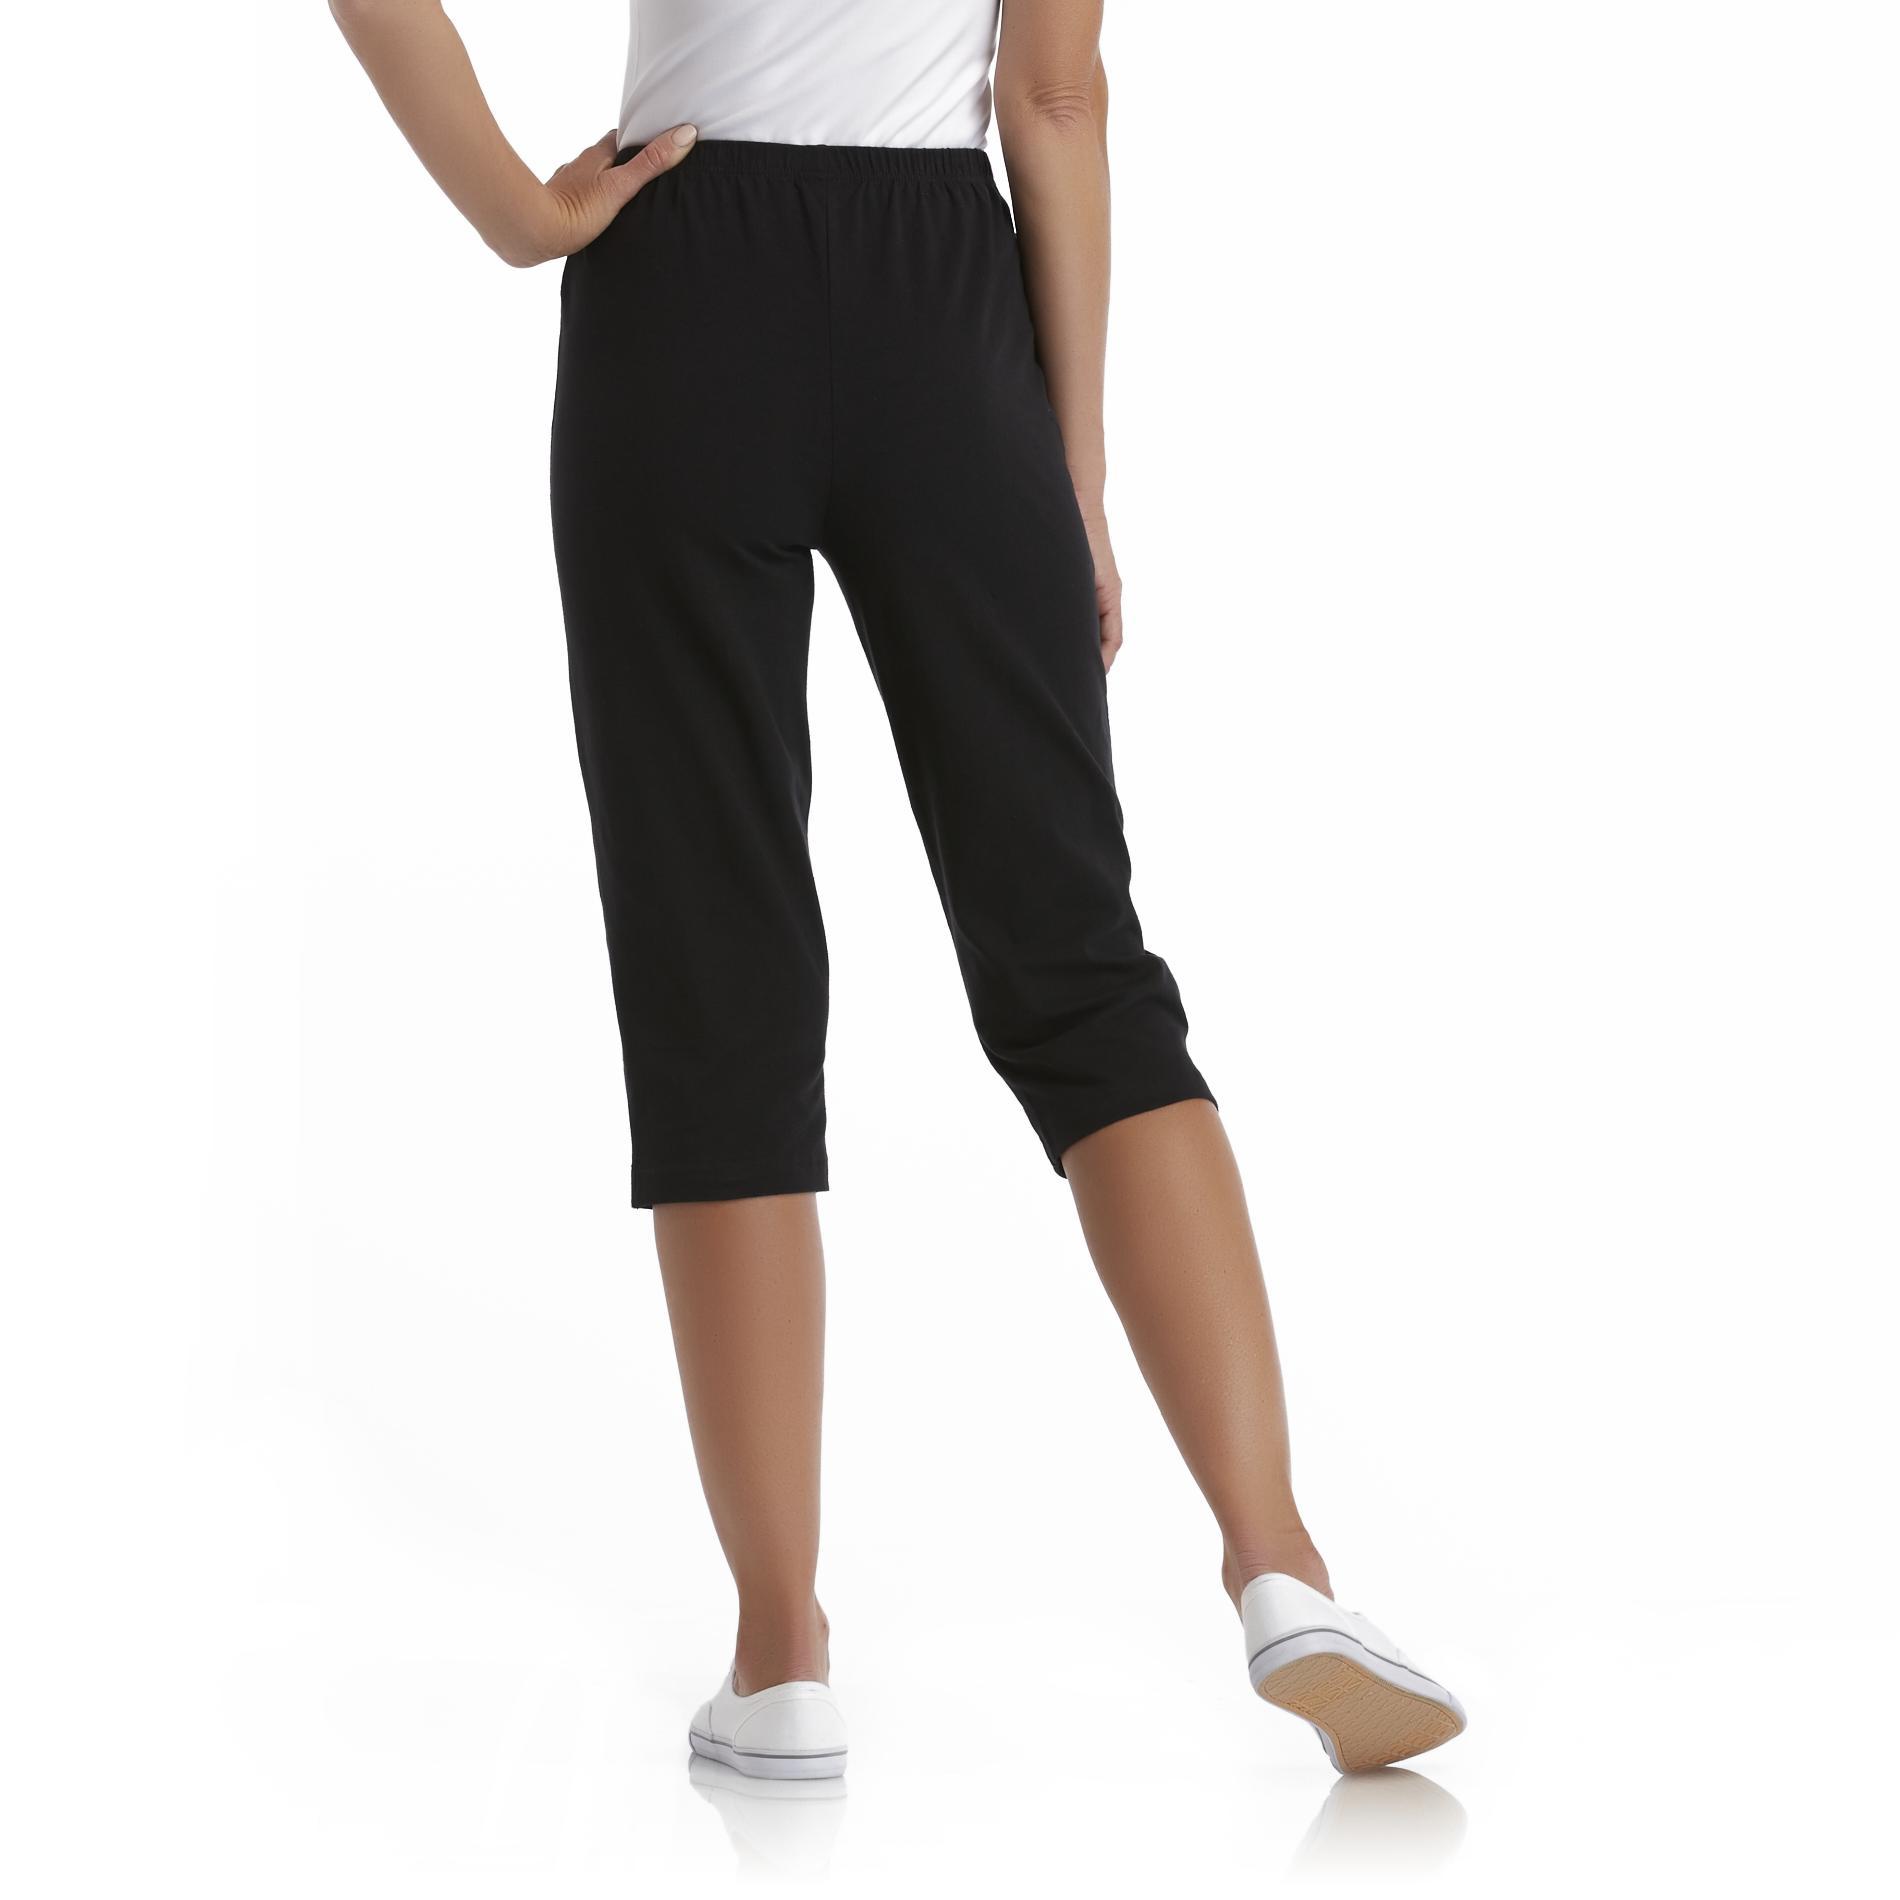 Basic Editions Women' Knit Capri Leggings